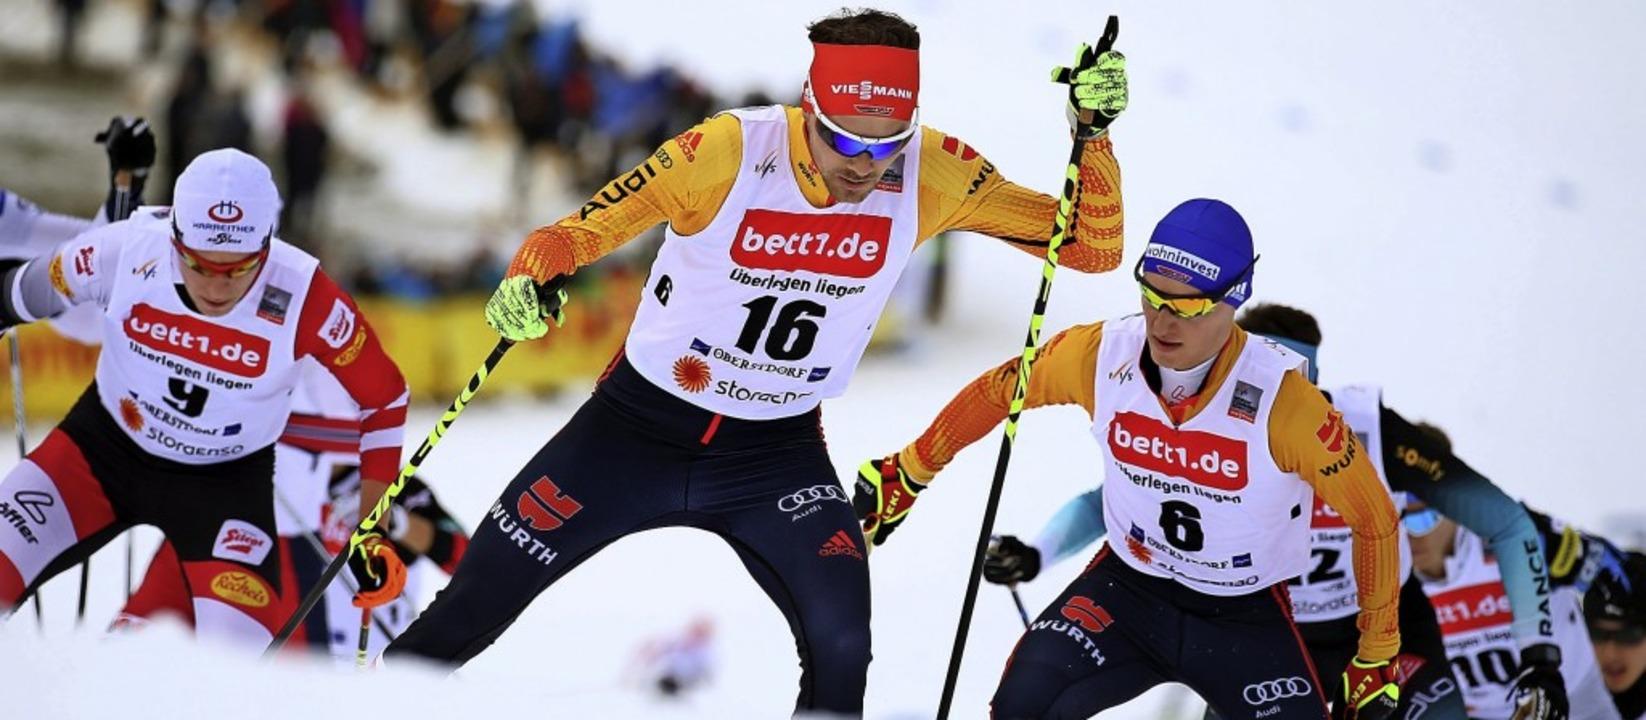 Solide bei den Sprüngen, robust auf de...ummer 16) und Manuel Faißt (rechts).    | Foto: Karl-Josef Hildenbrand (dpa)